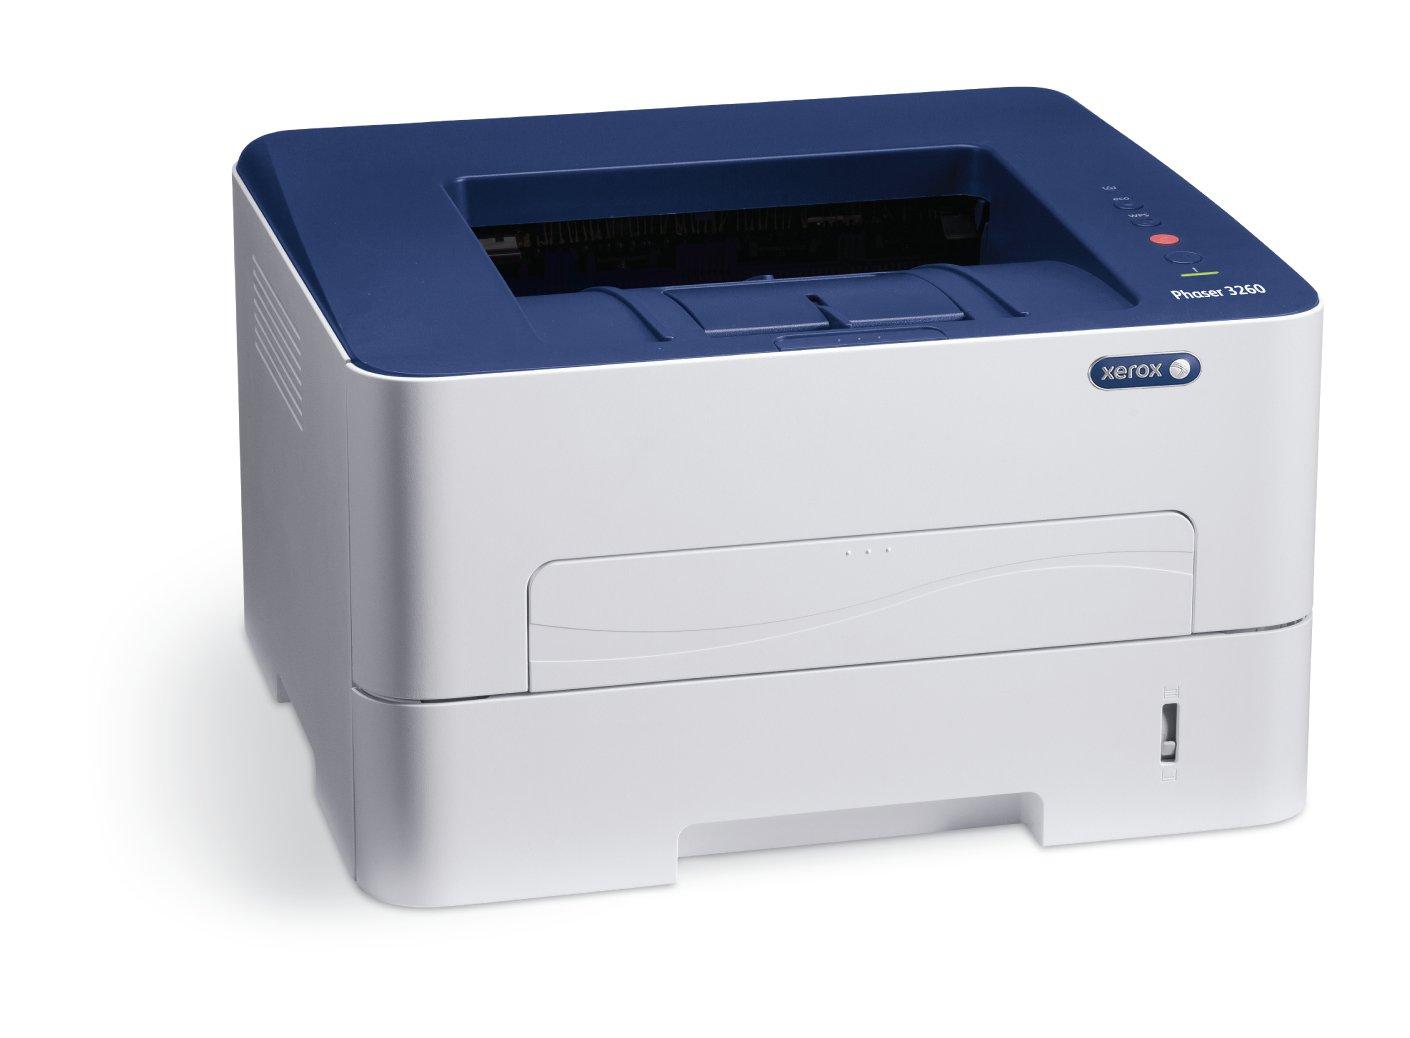 Xerox Phaser 3260/DI Monchrome Laser Printer